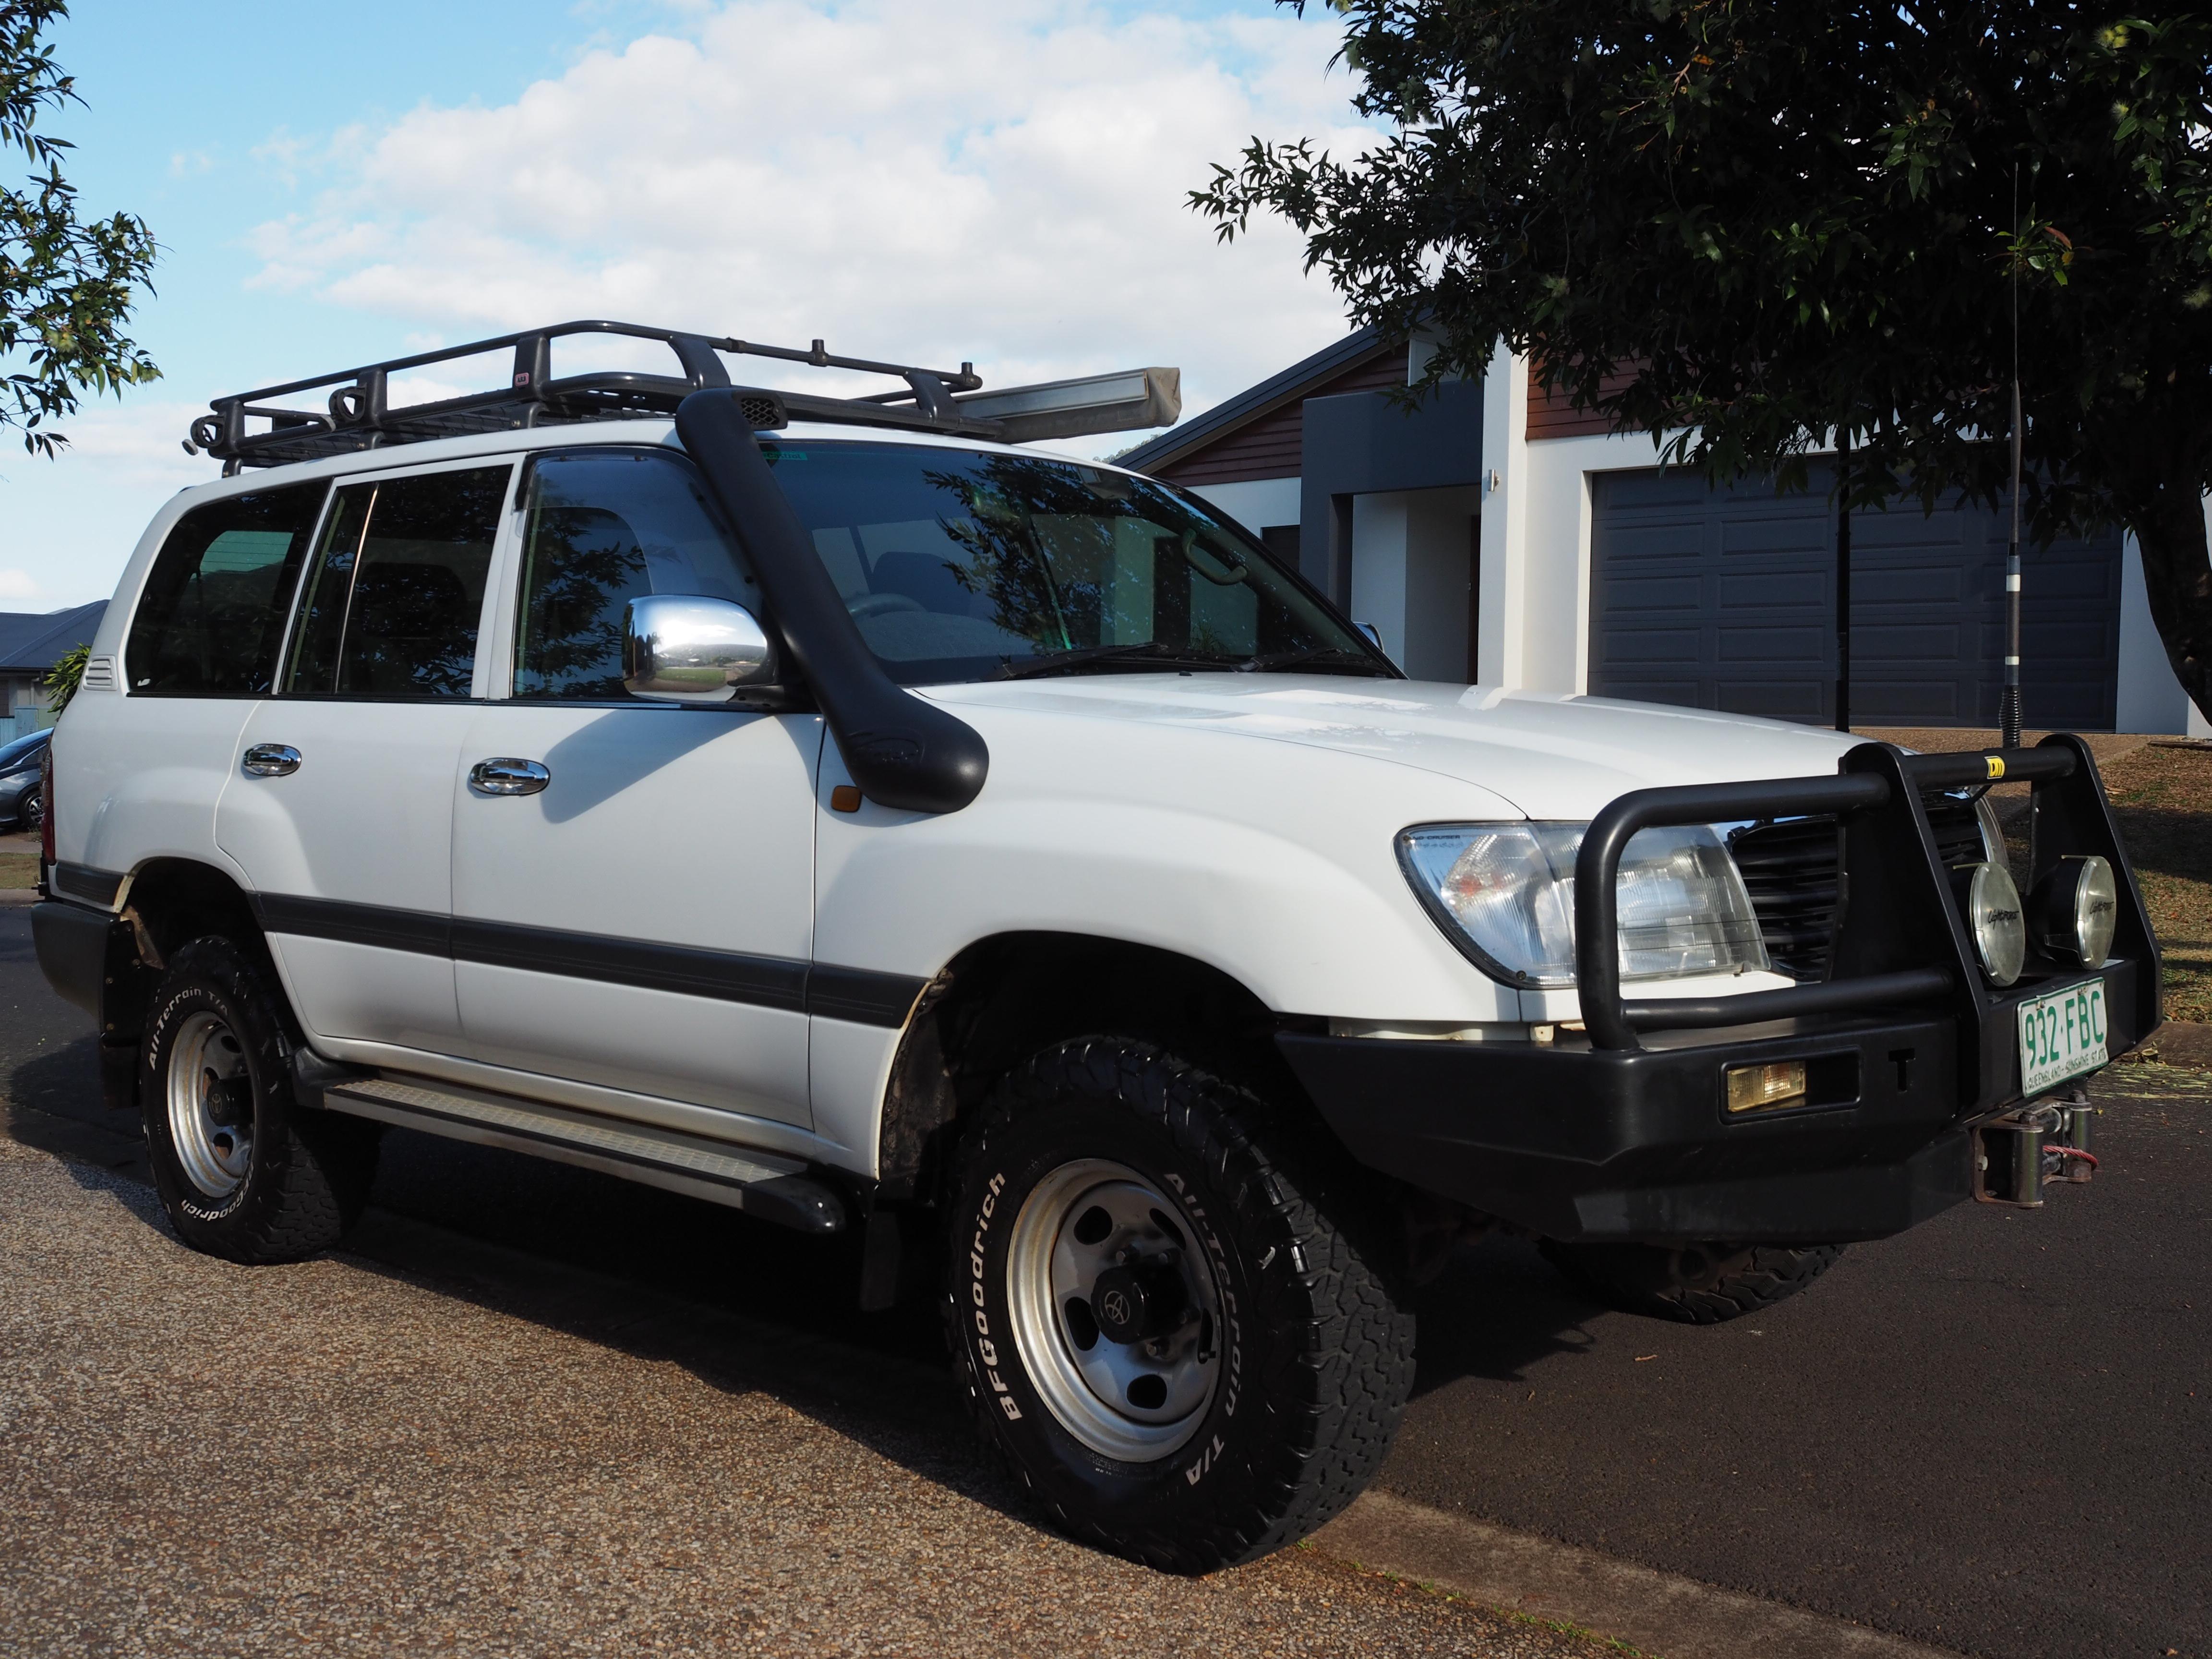 1999 GXL 8 Seater S/W. Man. diesel 275600km.   RWC VGC A/M Turbo, Full range of extas.   ...